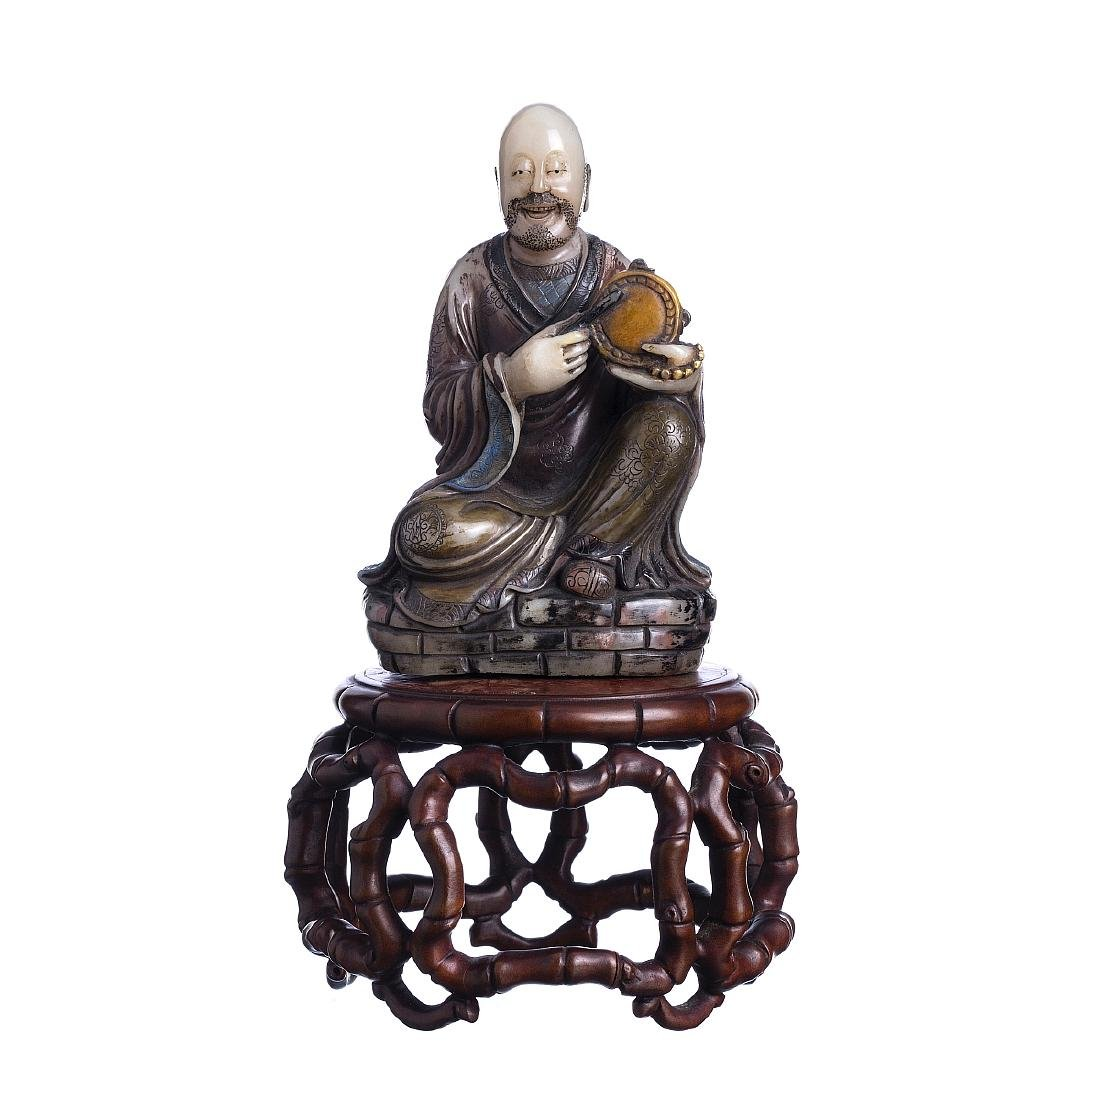 Chinese musician in hardstone, Guangxu